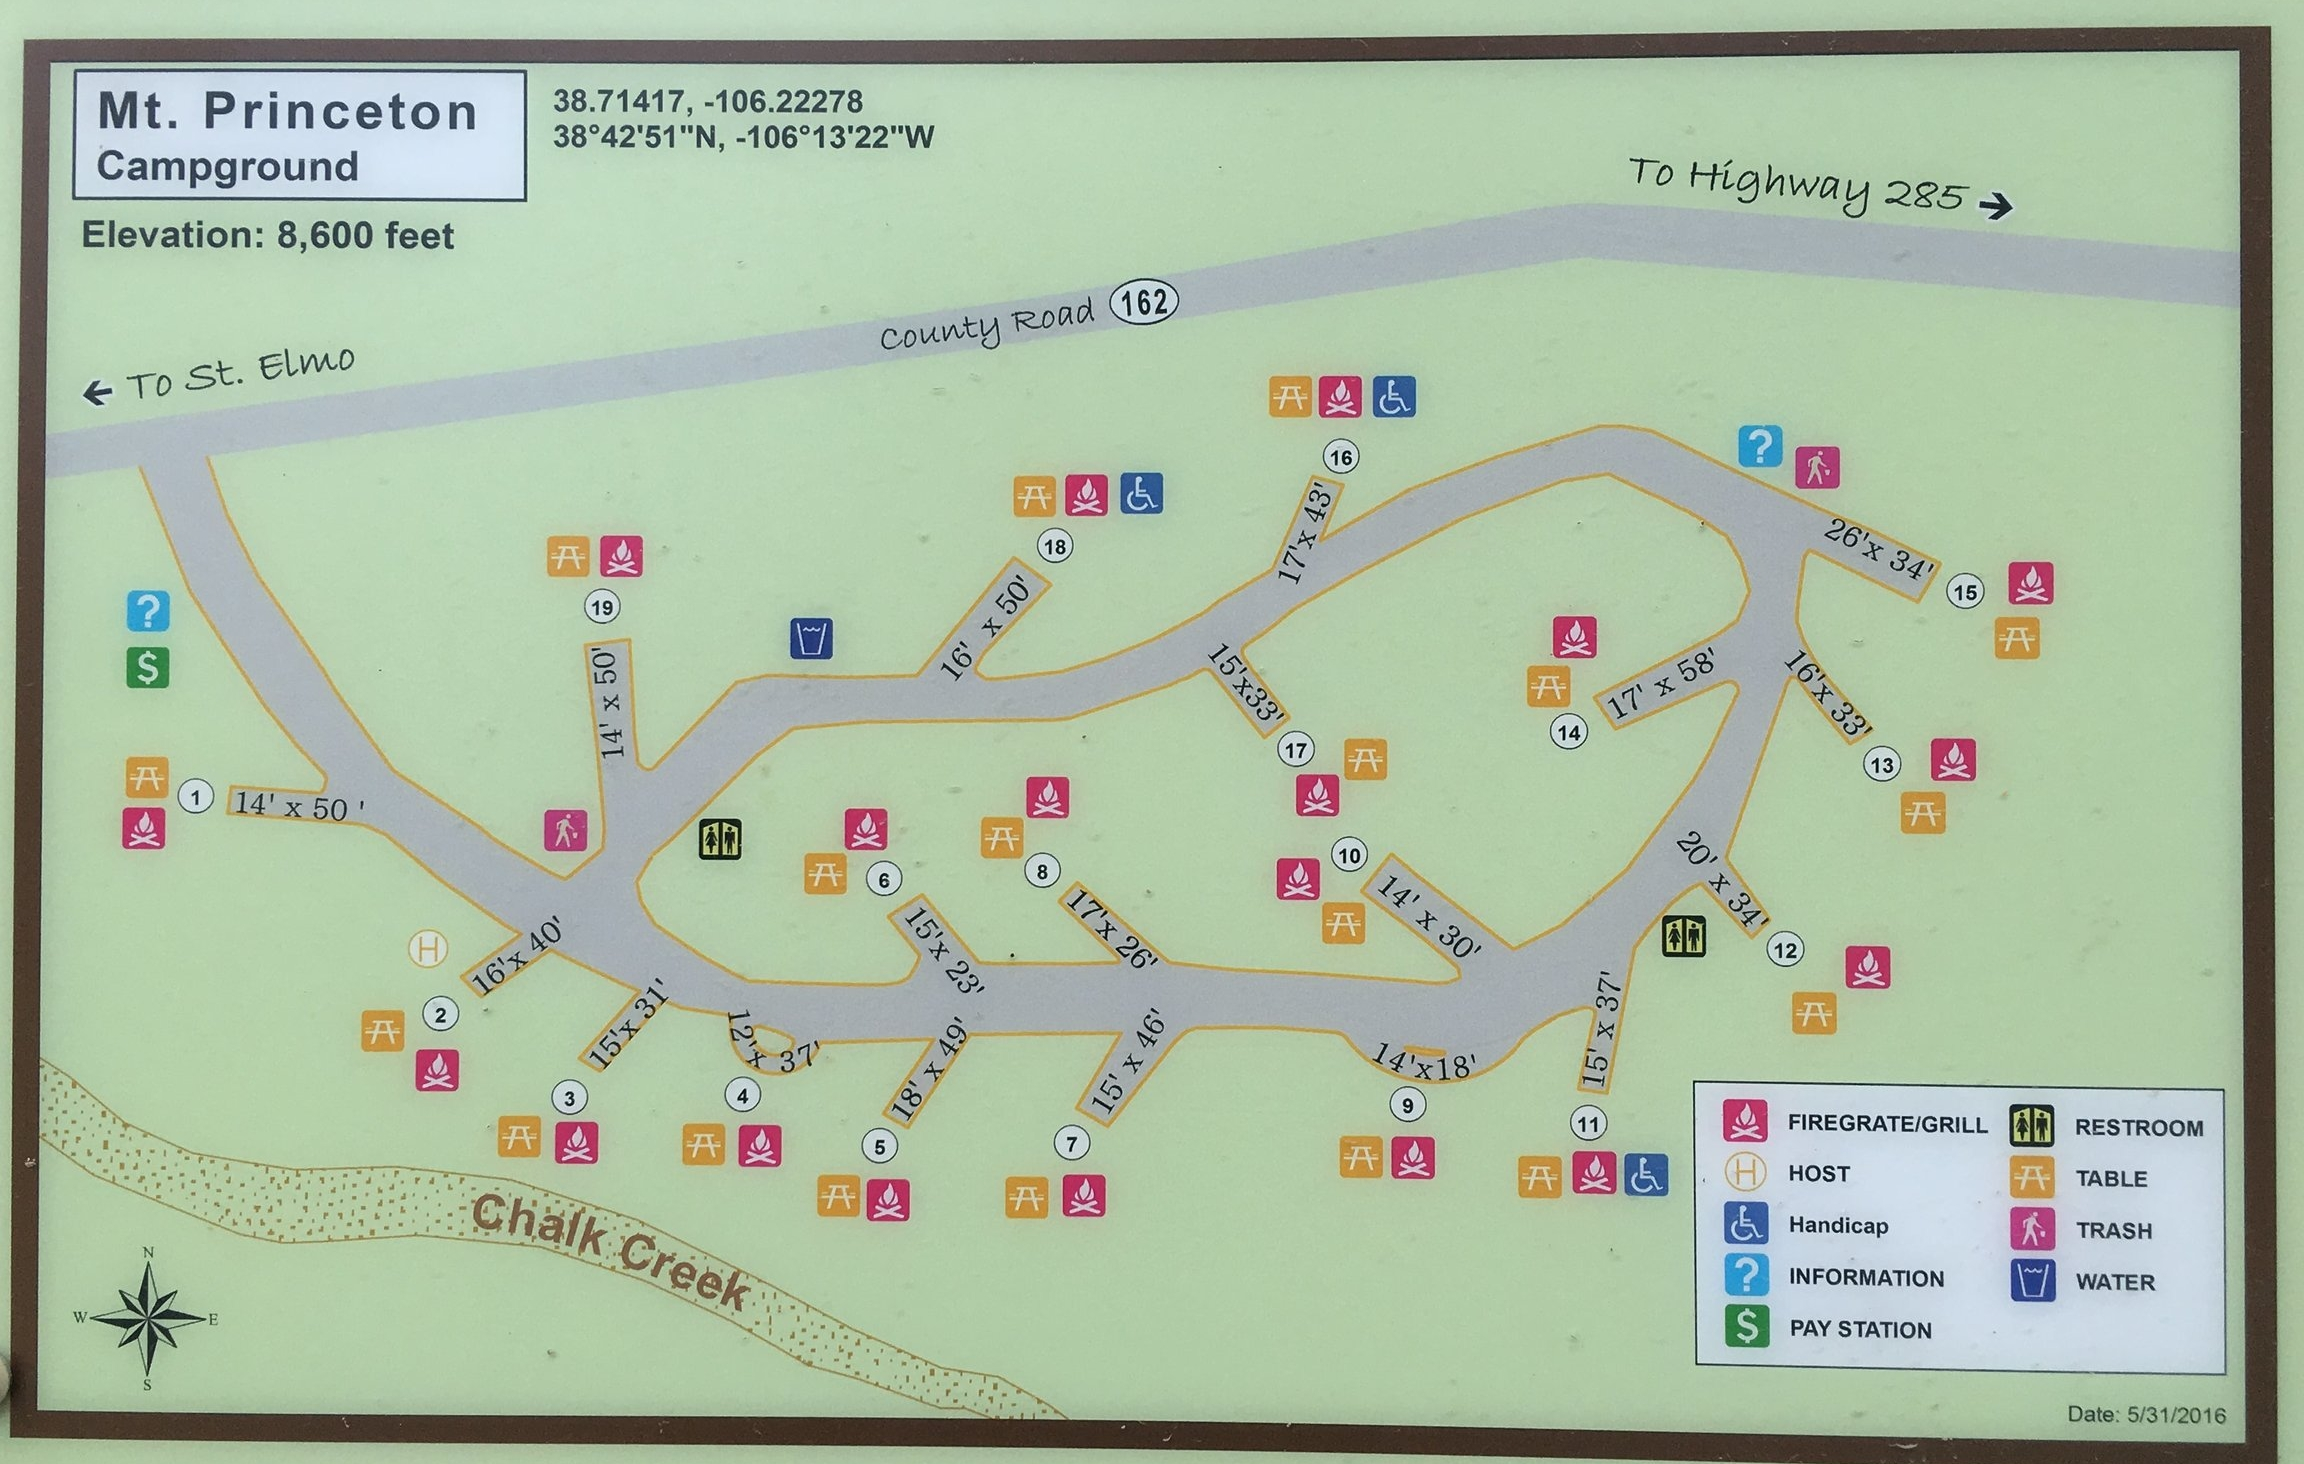 Mt Princeton Campground Map